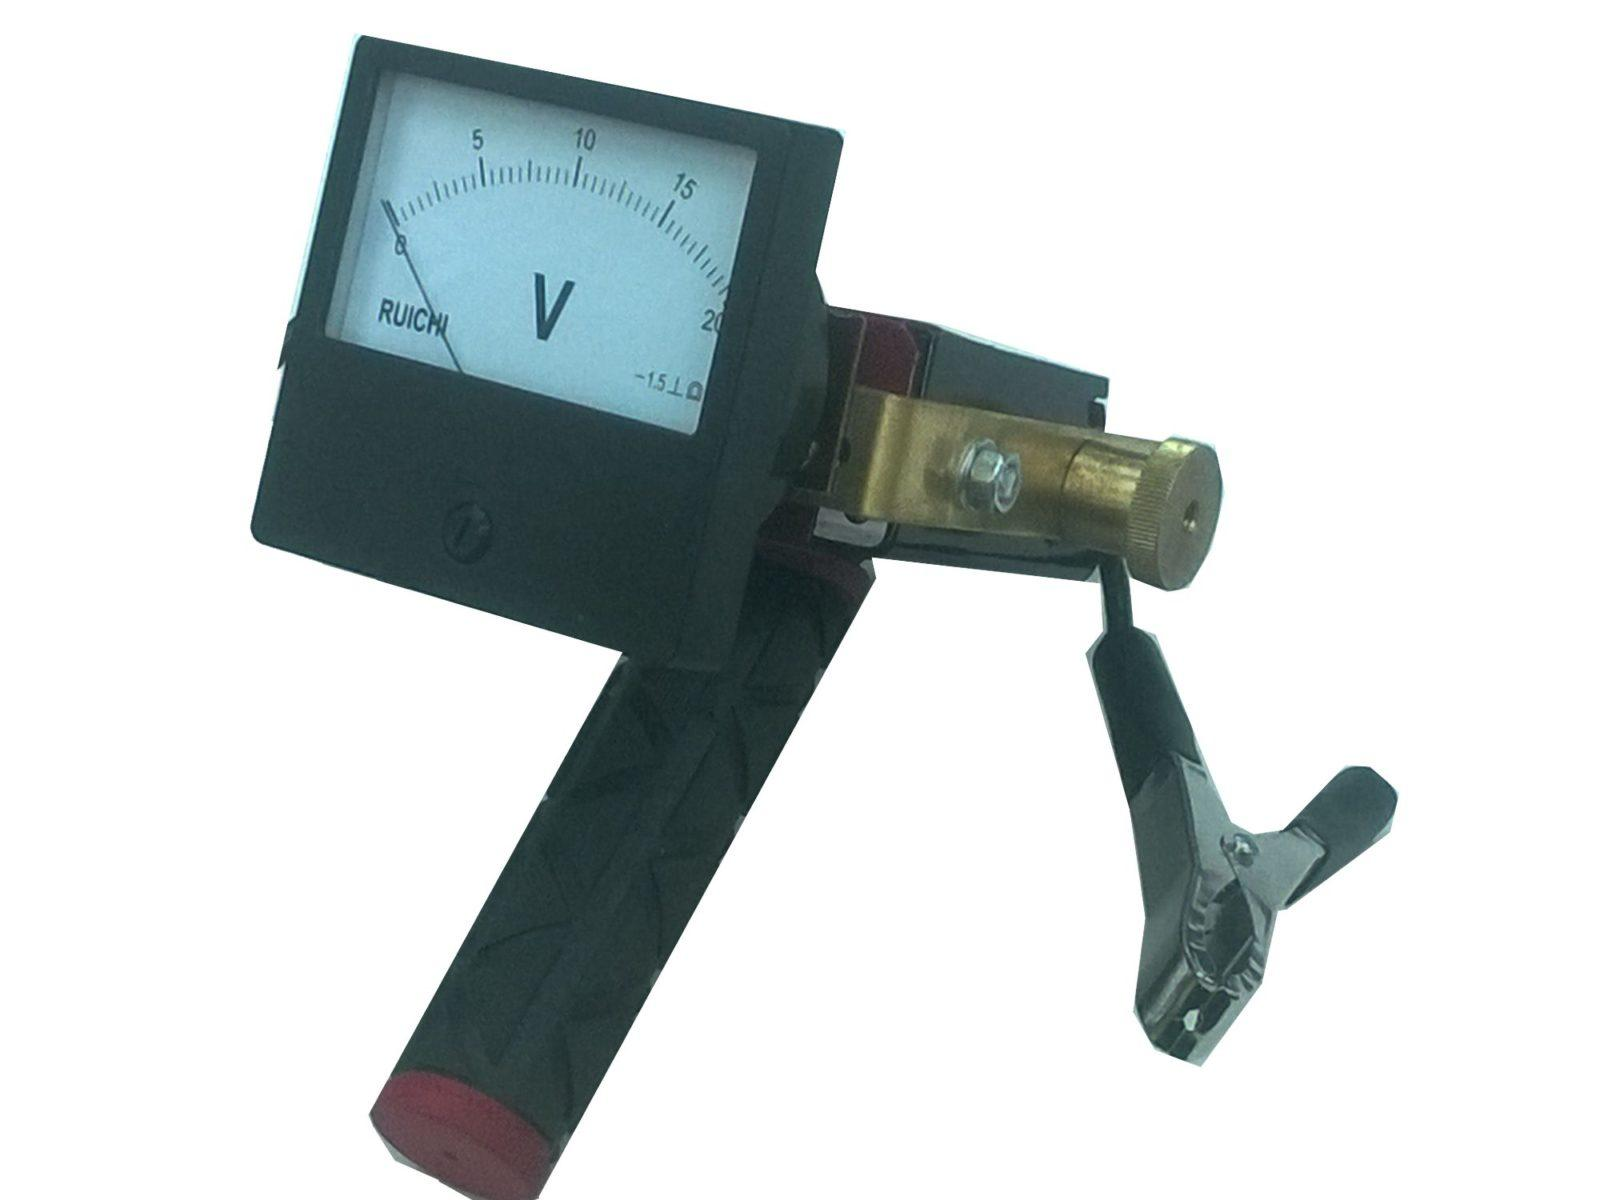 Нагрузочная вилка для проверки аккумуляторов